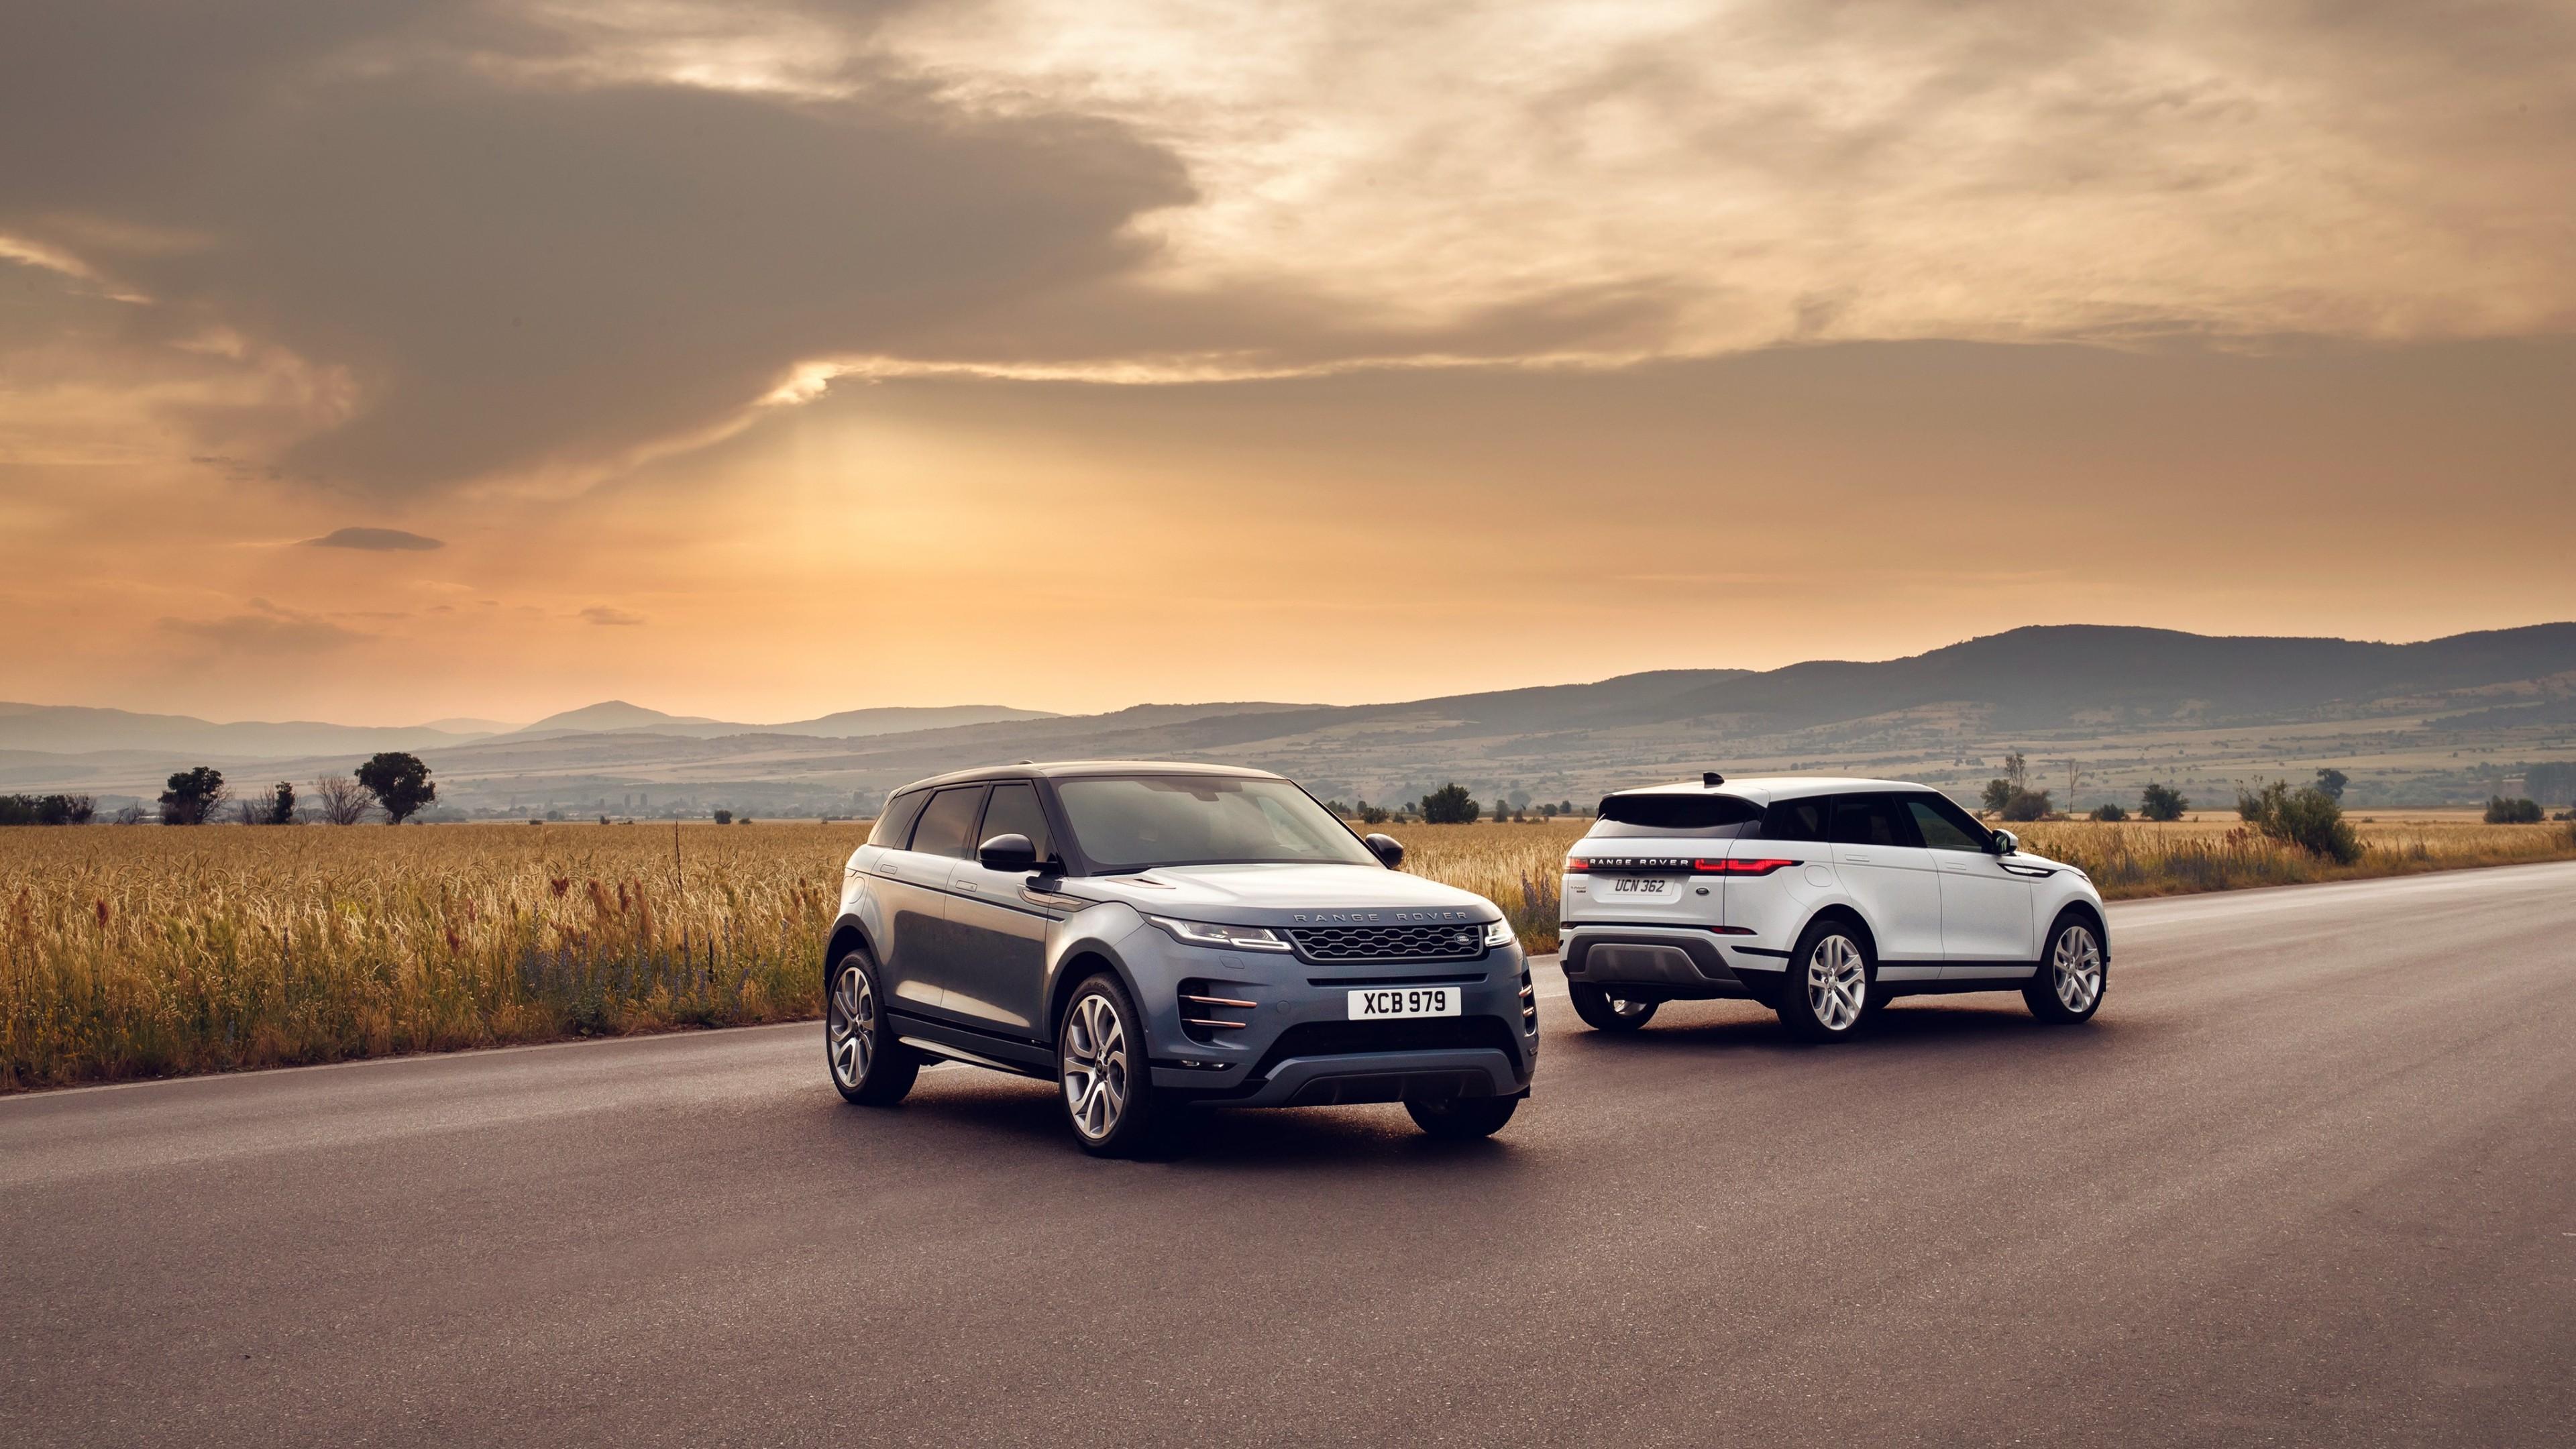 Wallpaper Range Rover Evoque SUV 2019 Cars 4K Cars Bikes 20941 3840x2160